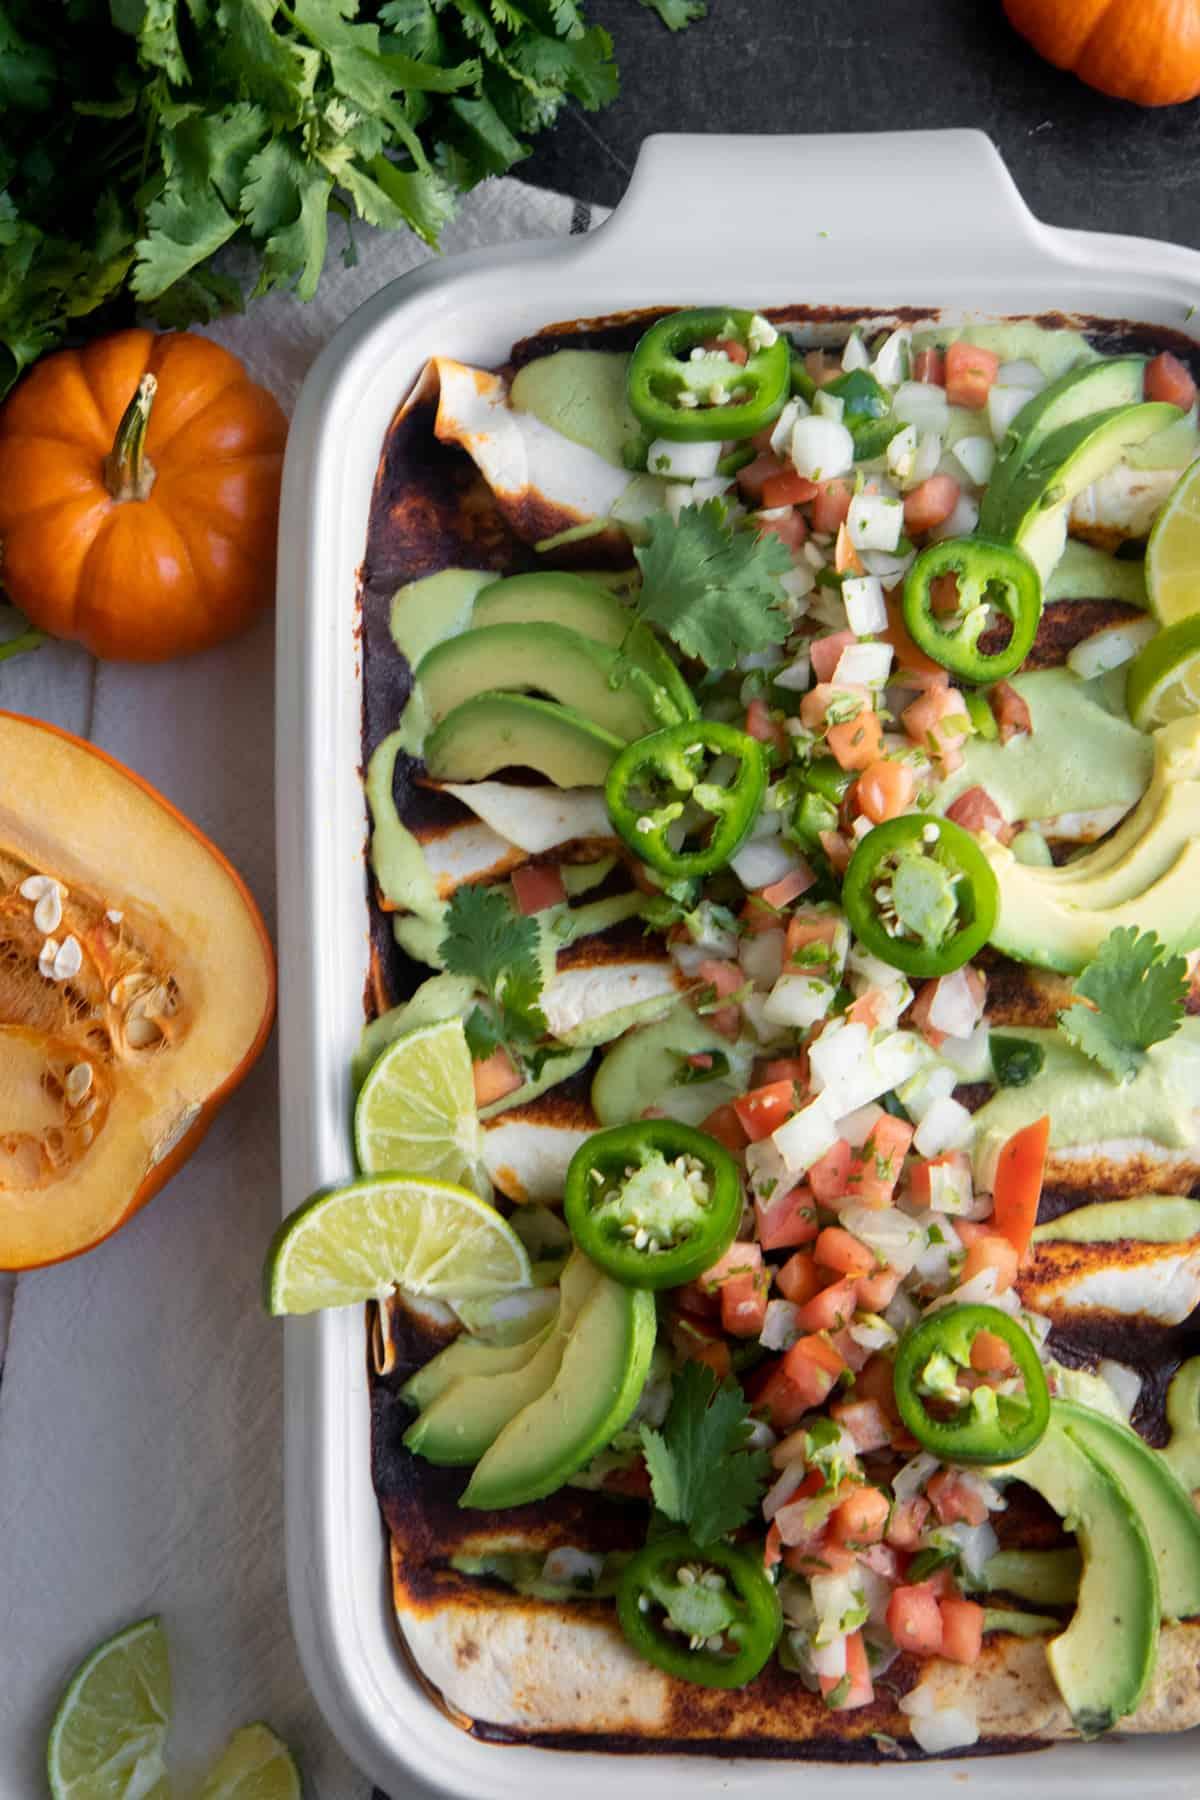 Close up of vegan enchiladas, topped with lime, avocado, and jalapeno.